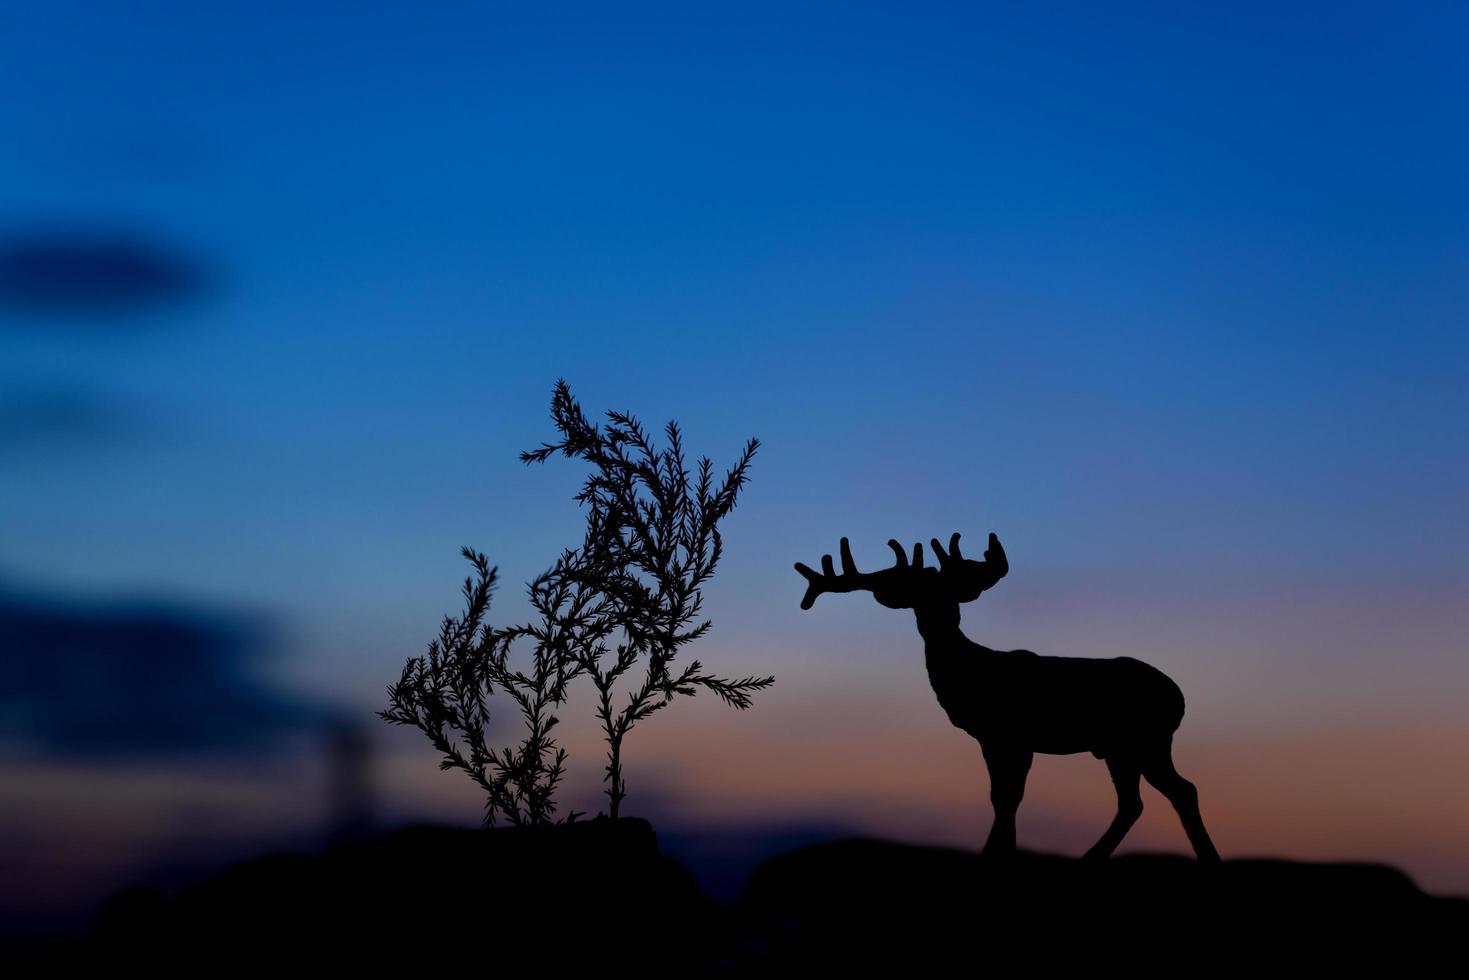 elandsilhouet bij zonsondergangachtergrond foto